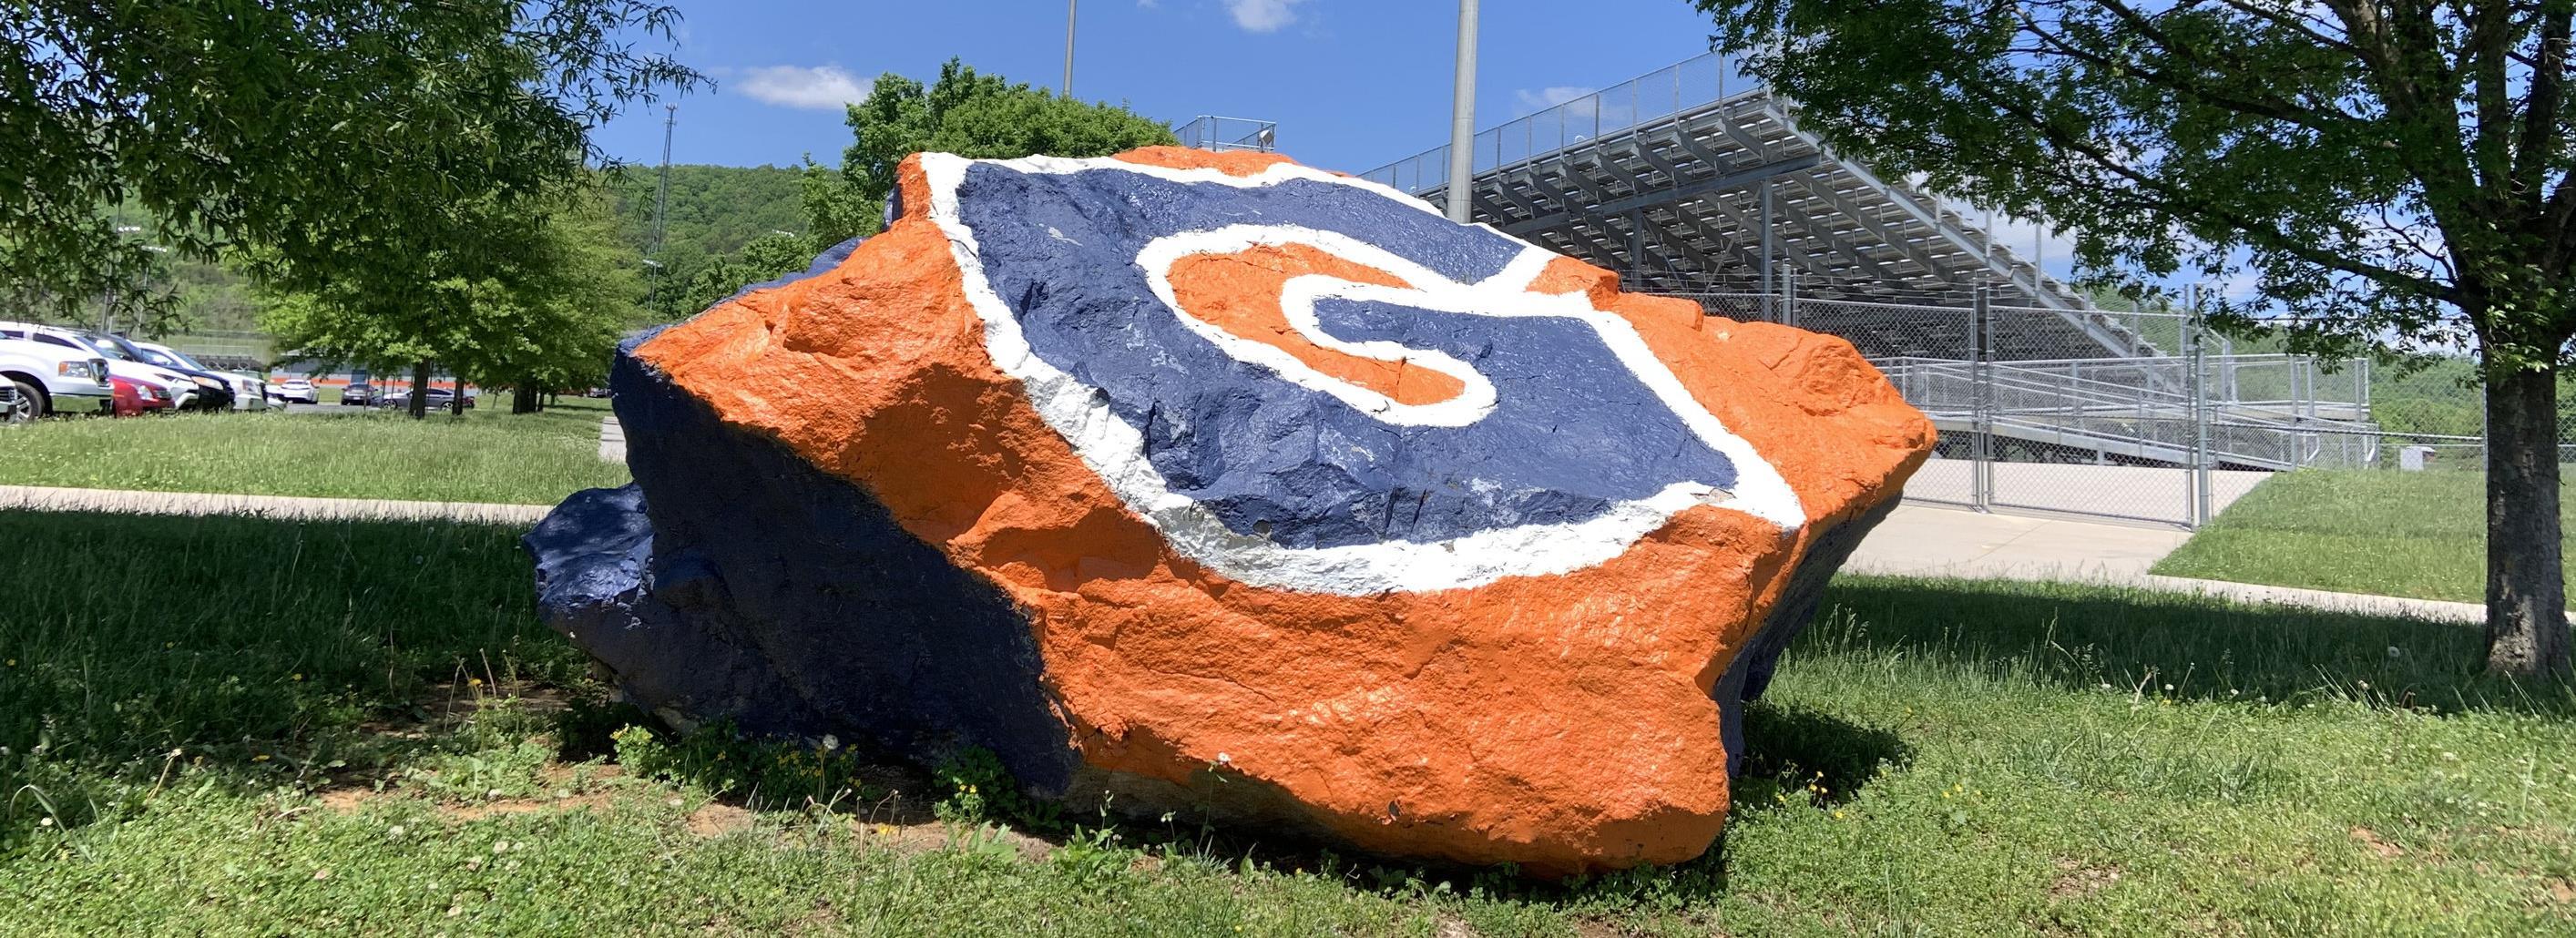 Grainger rock